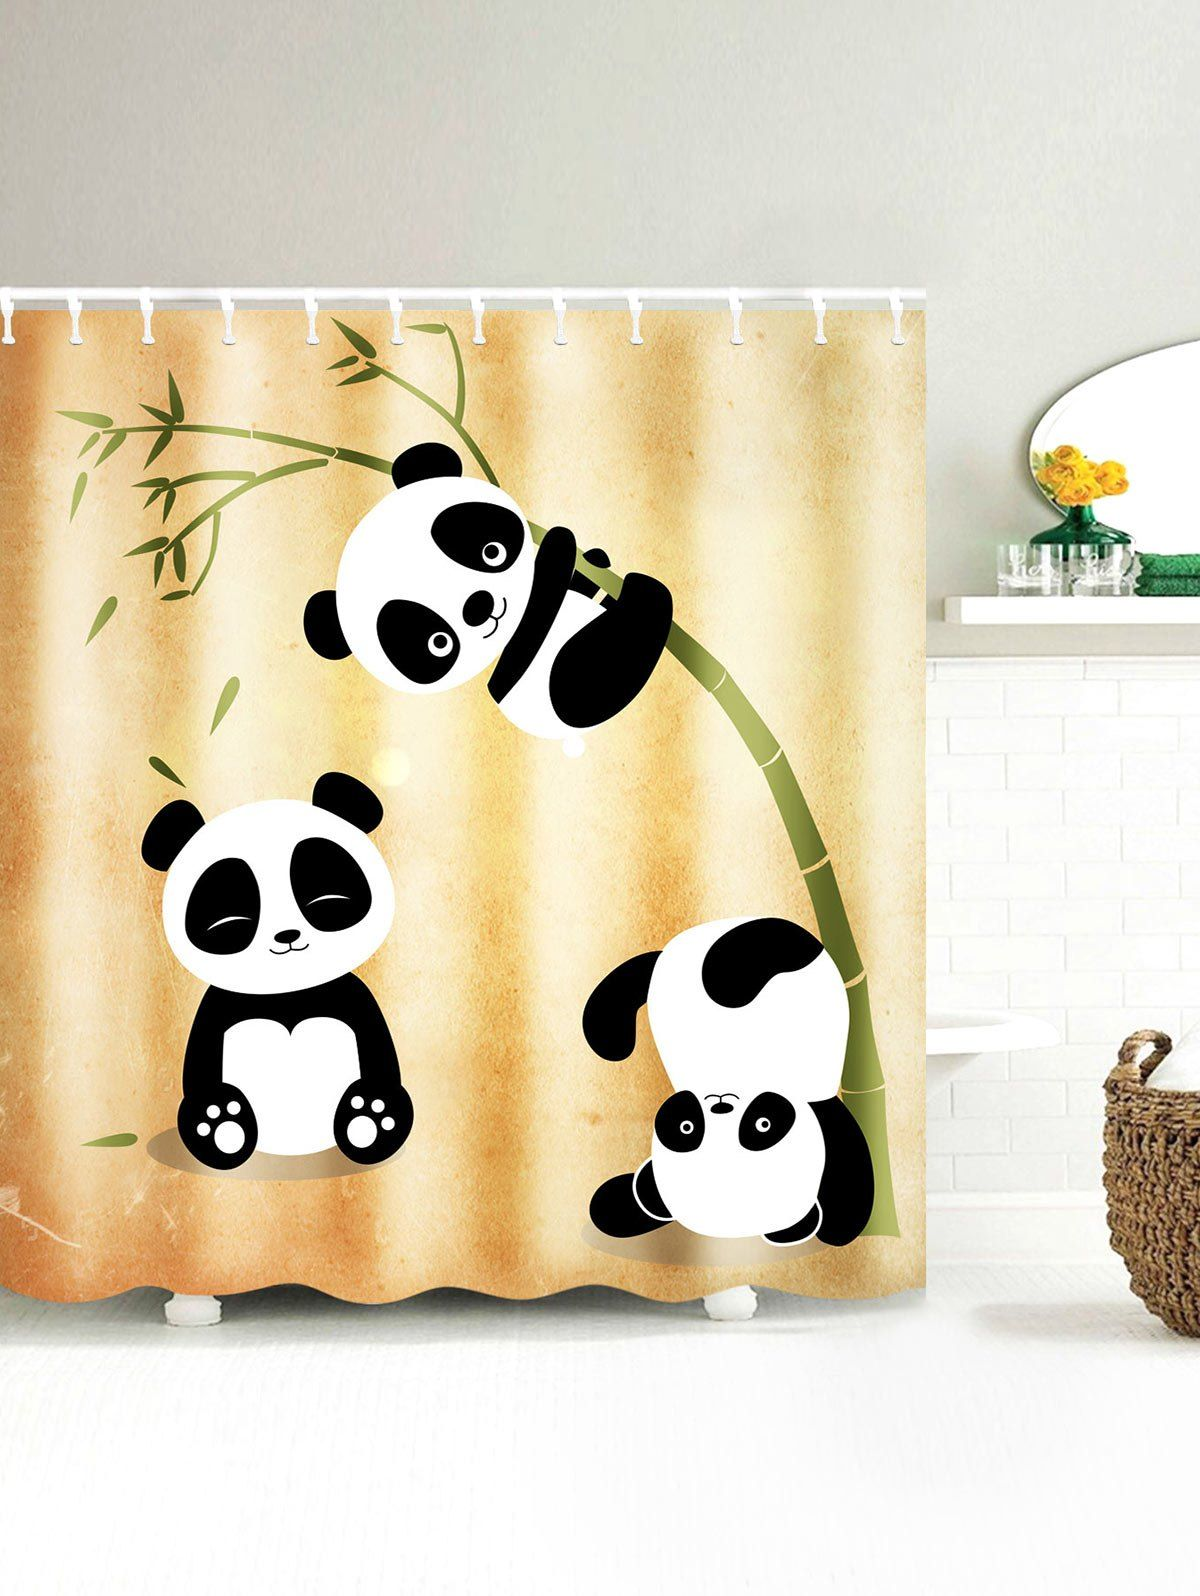 Three Pandas Play With Bamboo Print Waterproof Shower Curtain